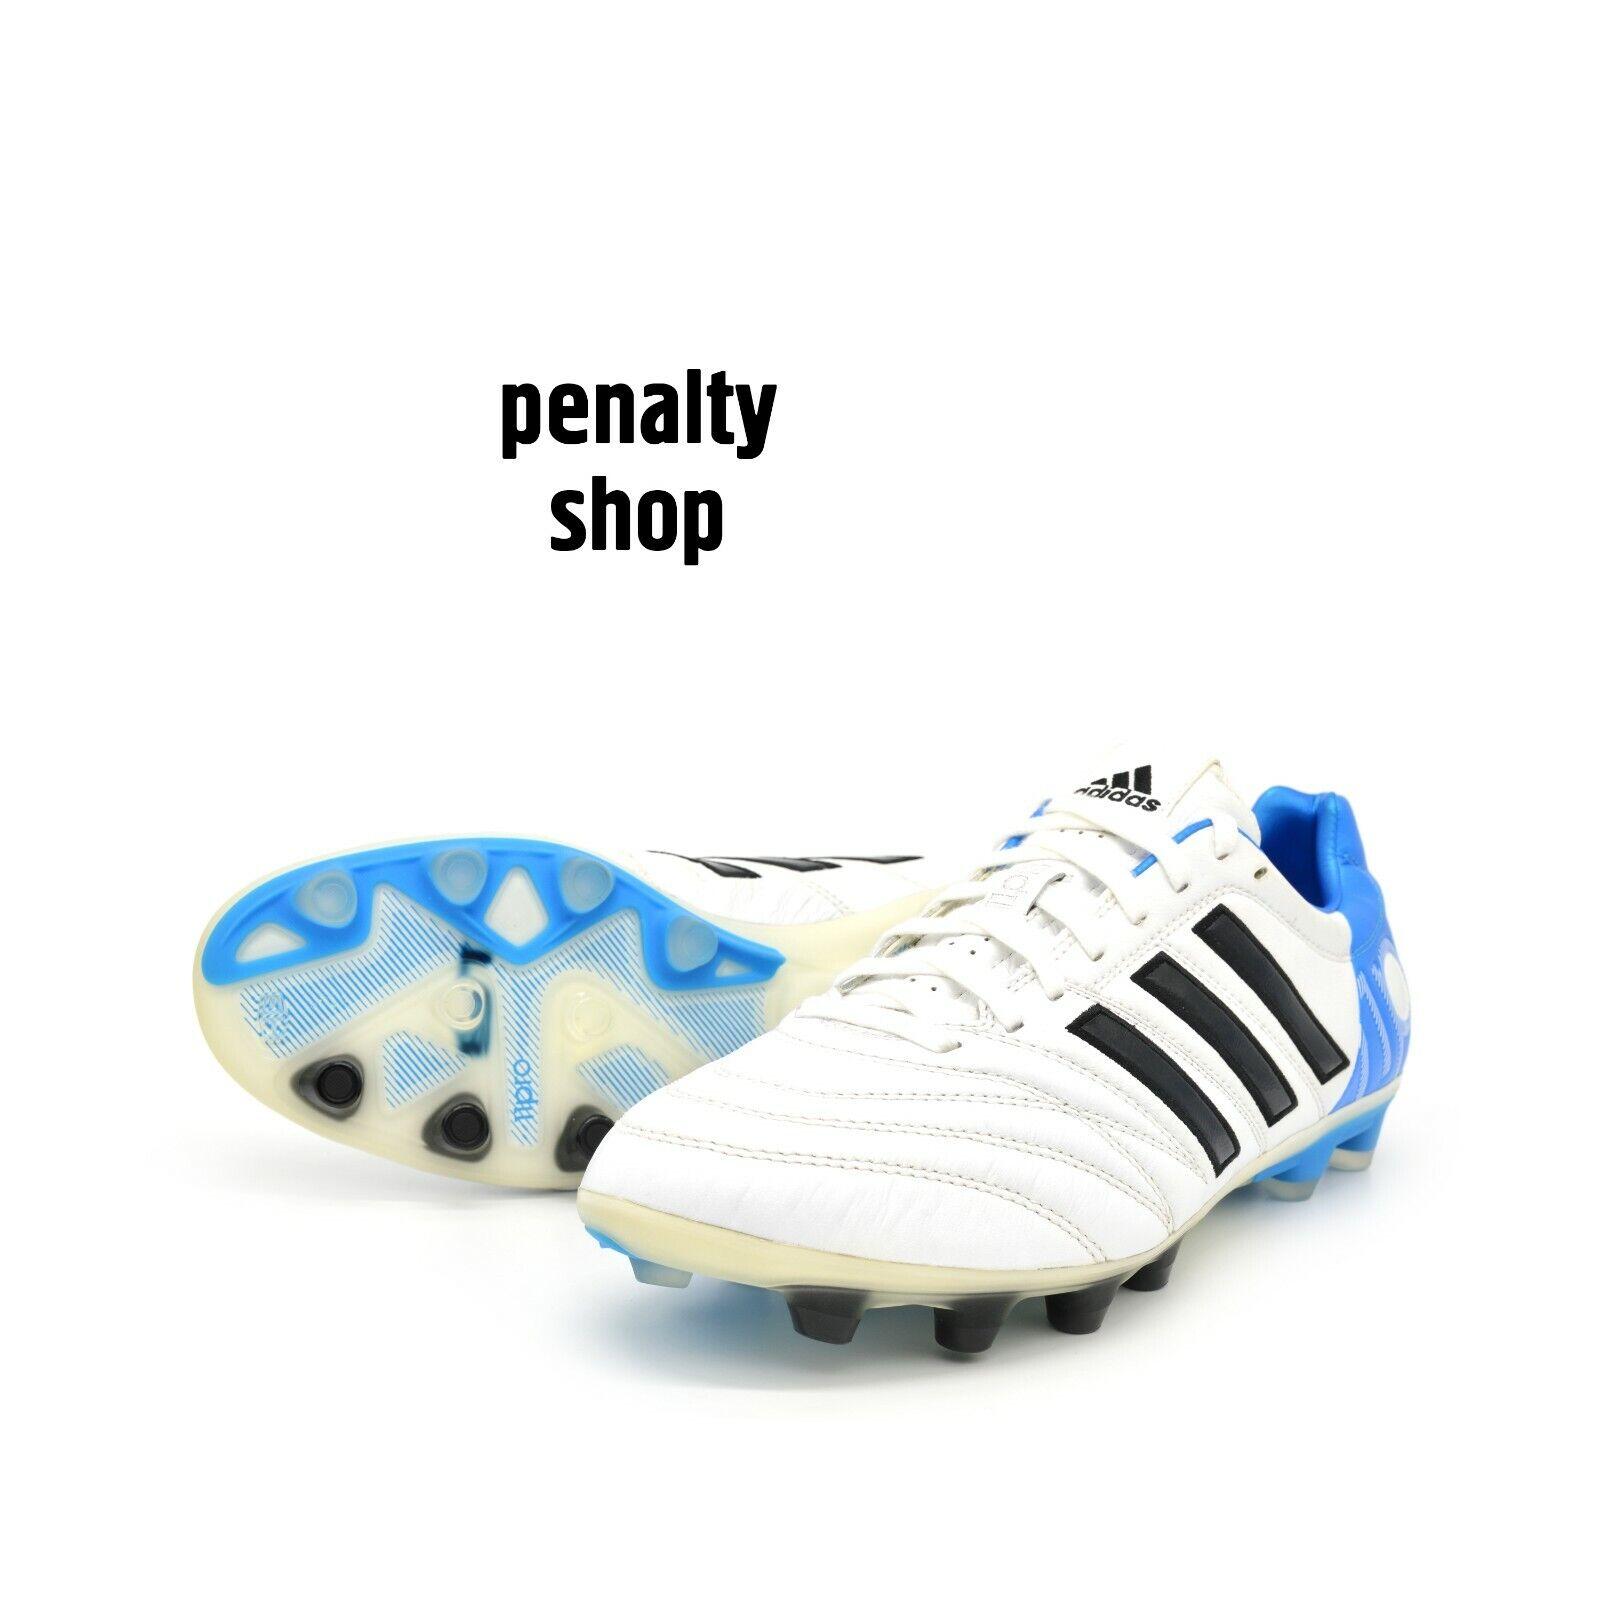 Adidas pathiqe 11Pro Hg F33129 Tony Kroos muestra Rara Edición Limitada